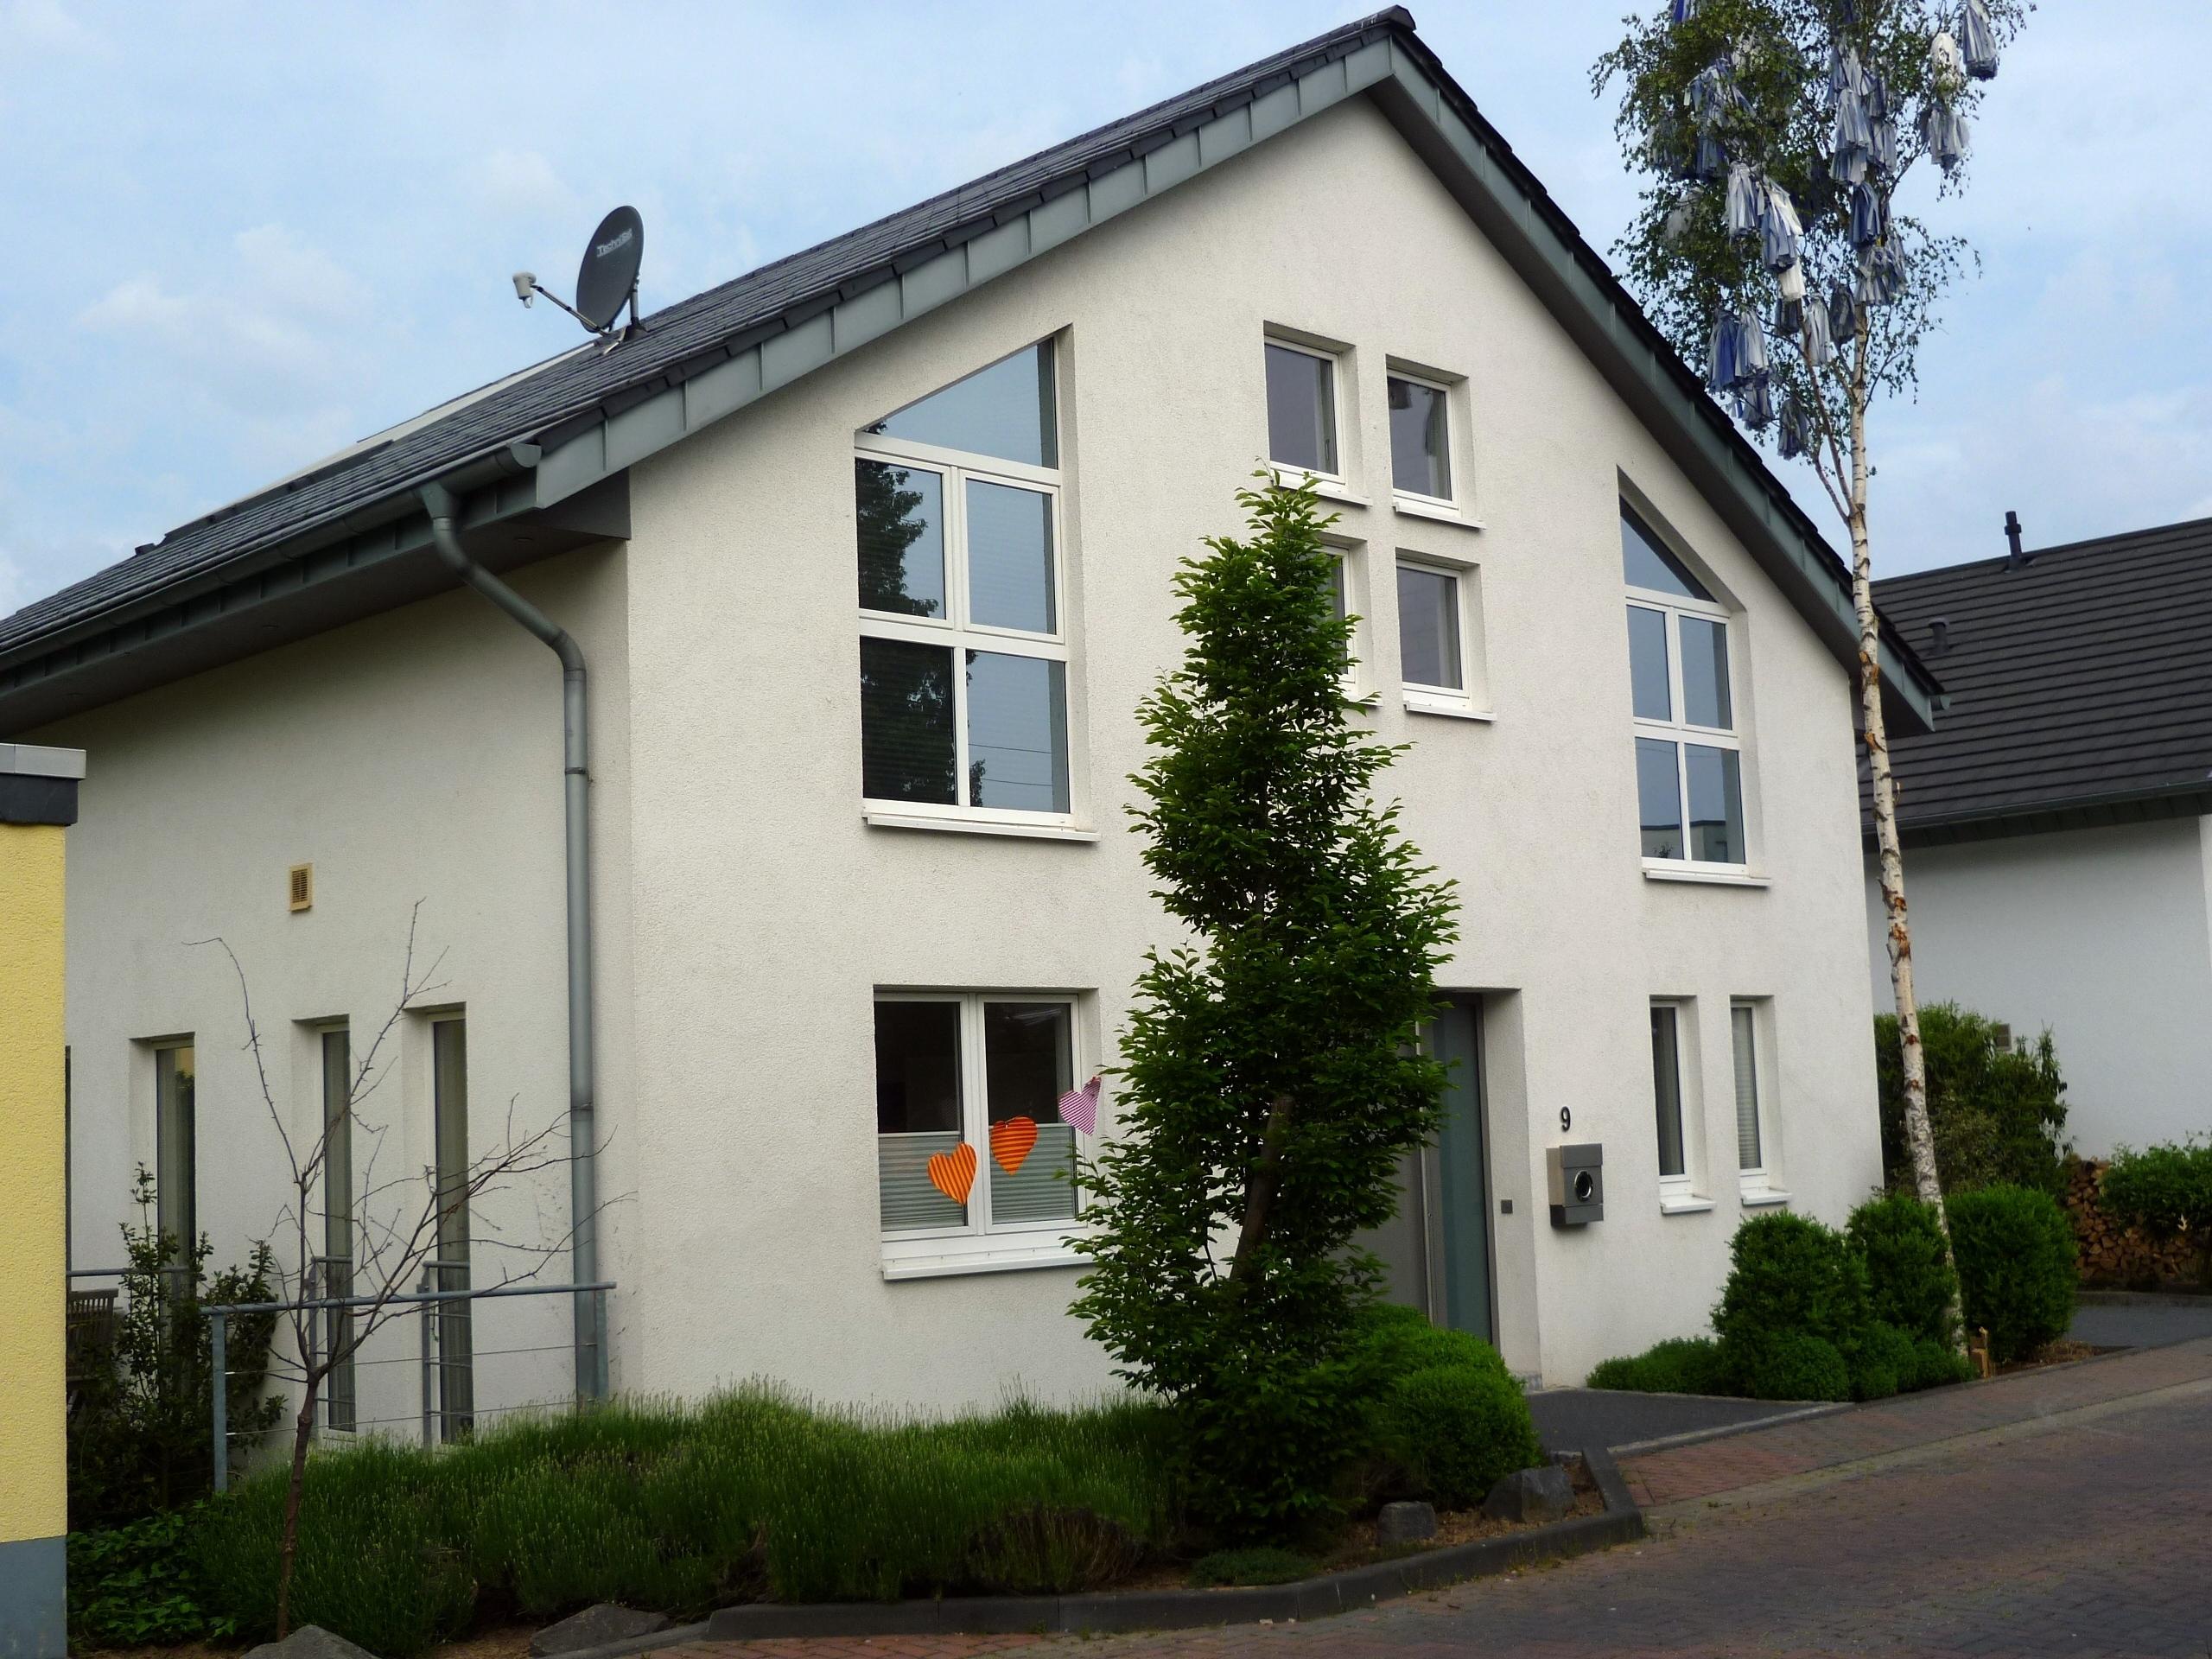 Einfamilienhaus in Kreuzau